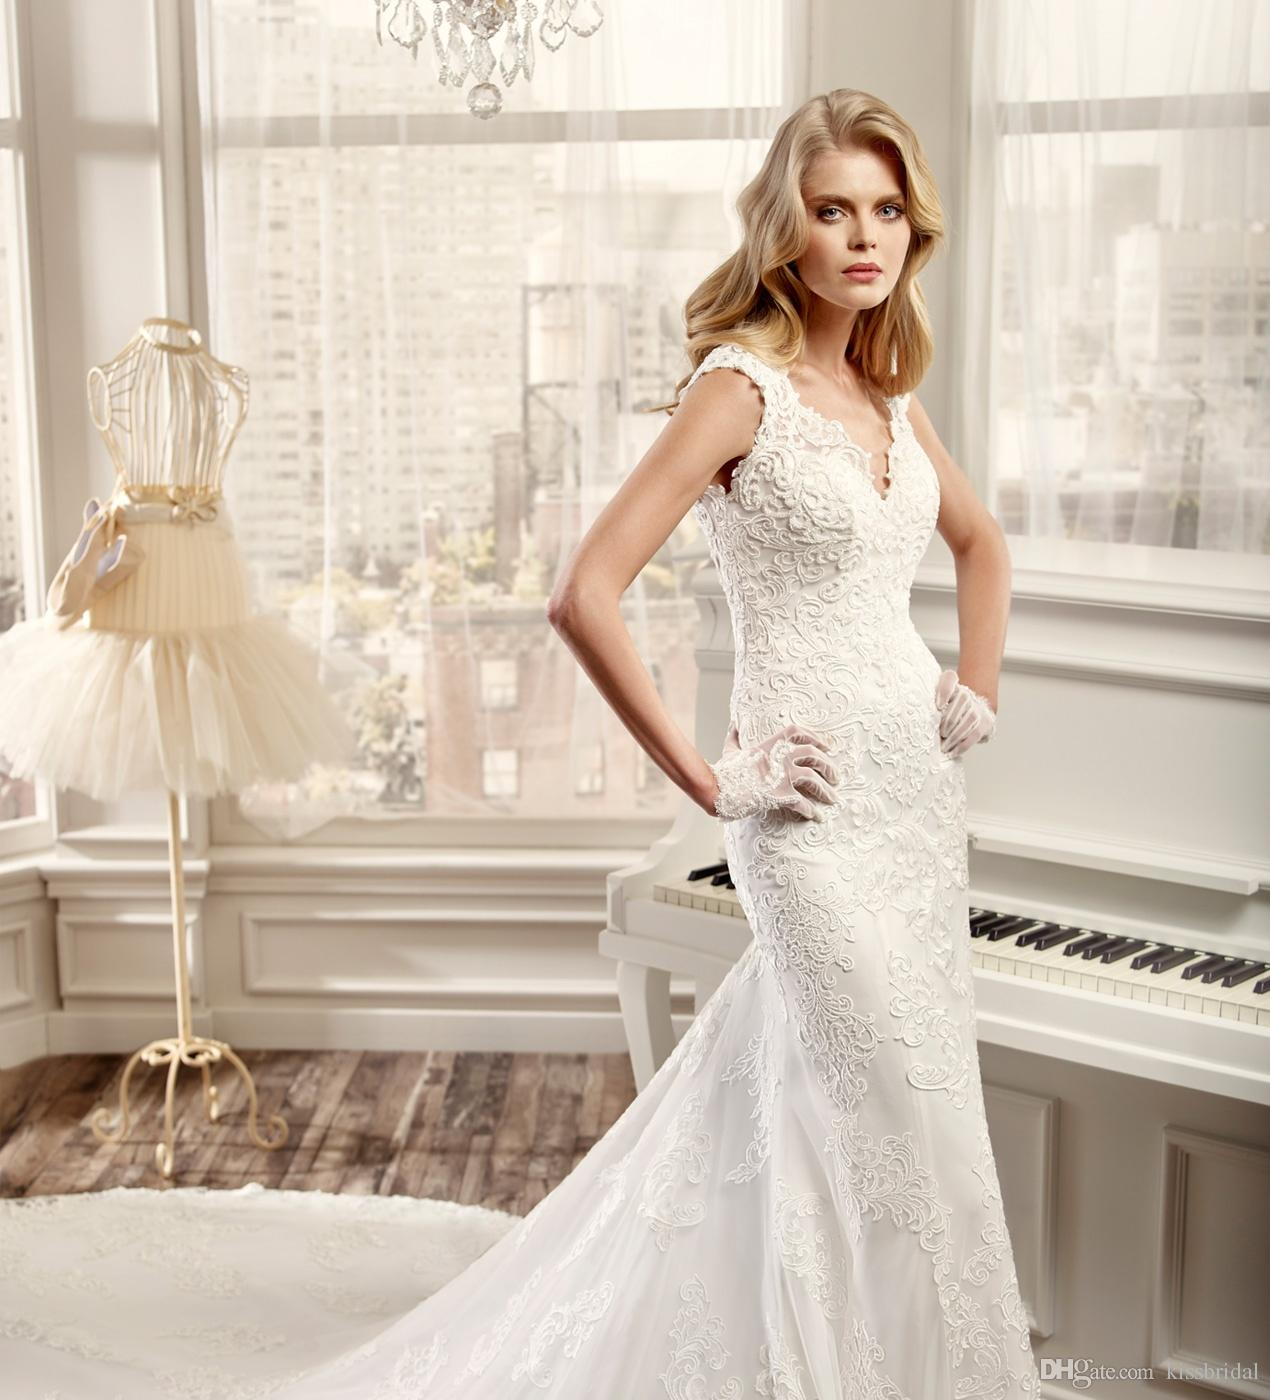 Vintage Full Lace Applique 2016 Wedding Dresses Mermaid V